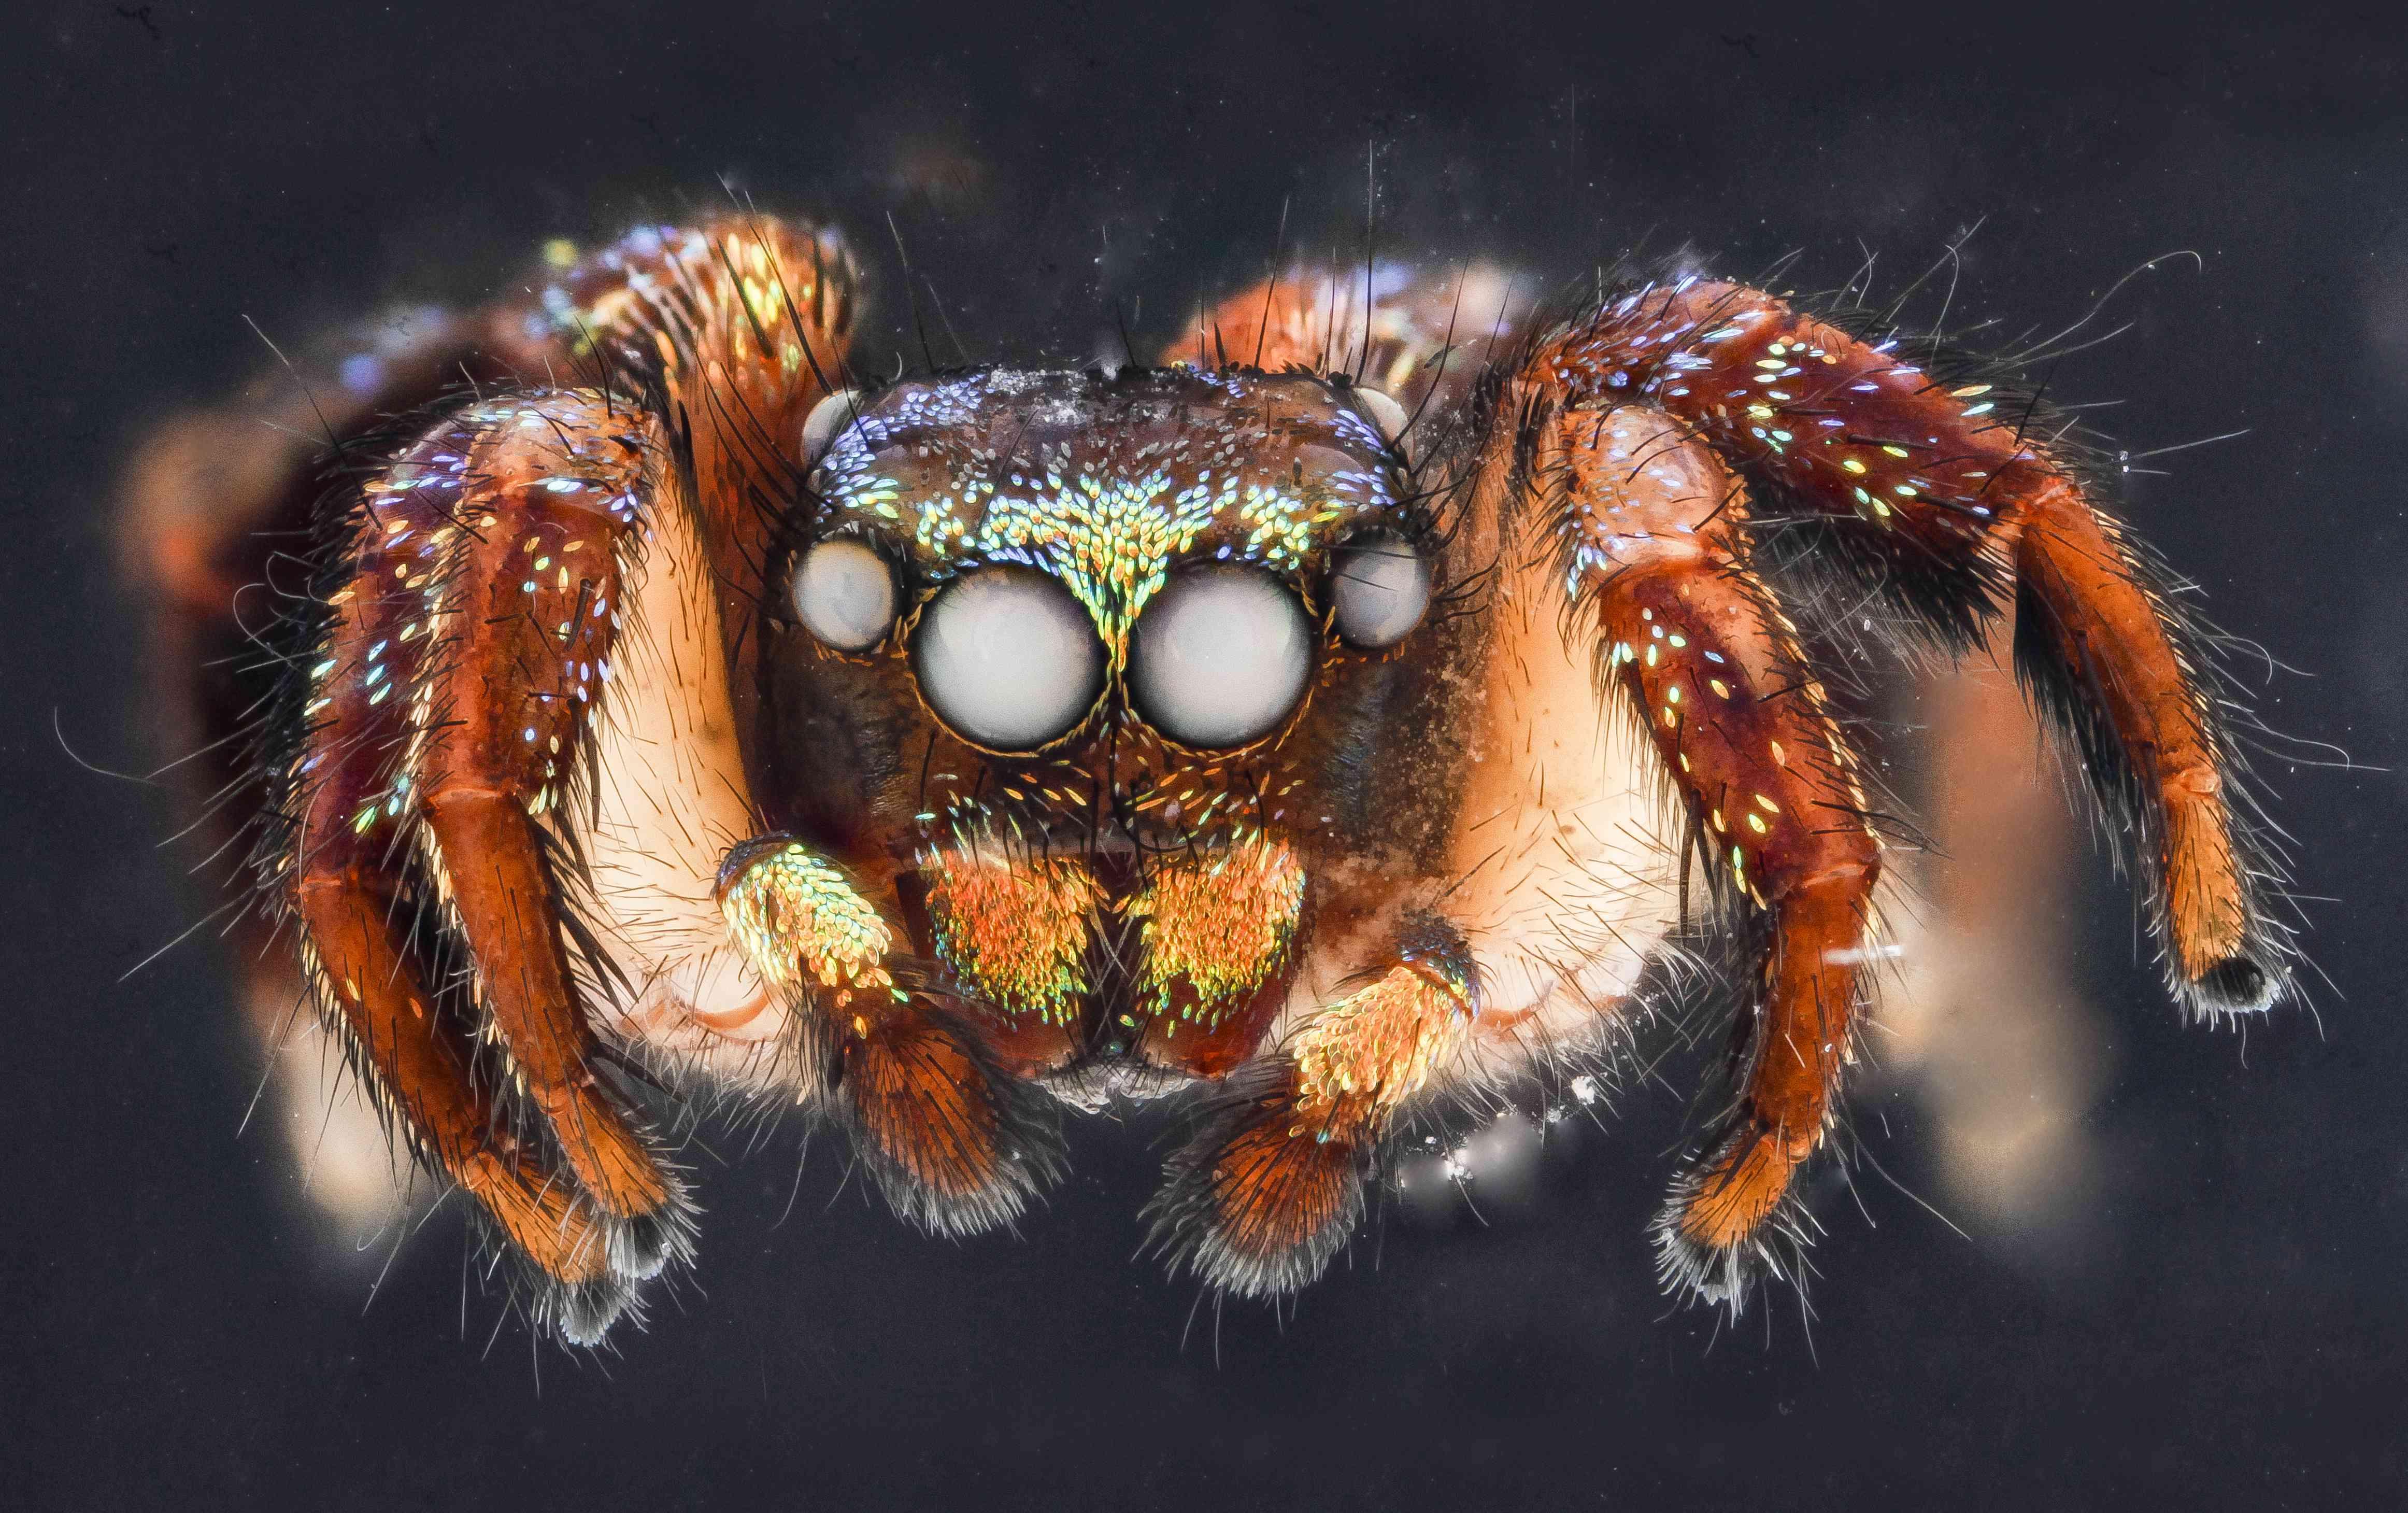 Christmas lights spider